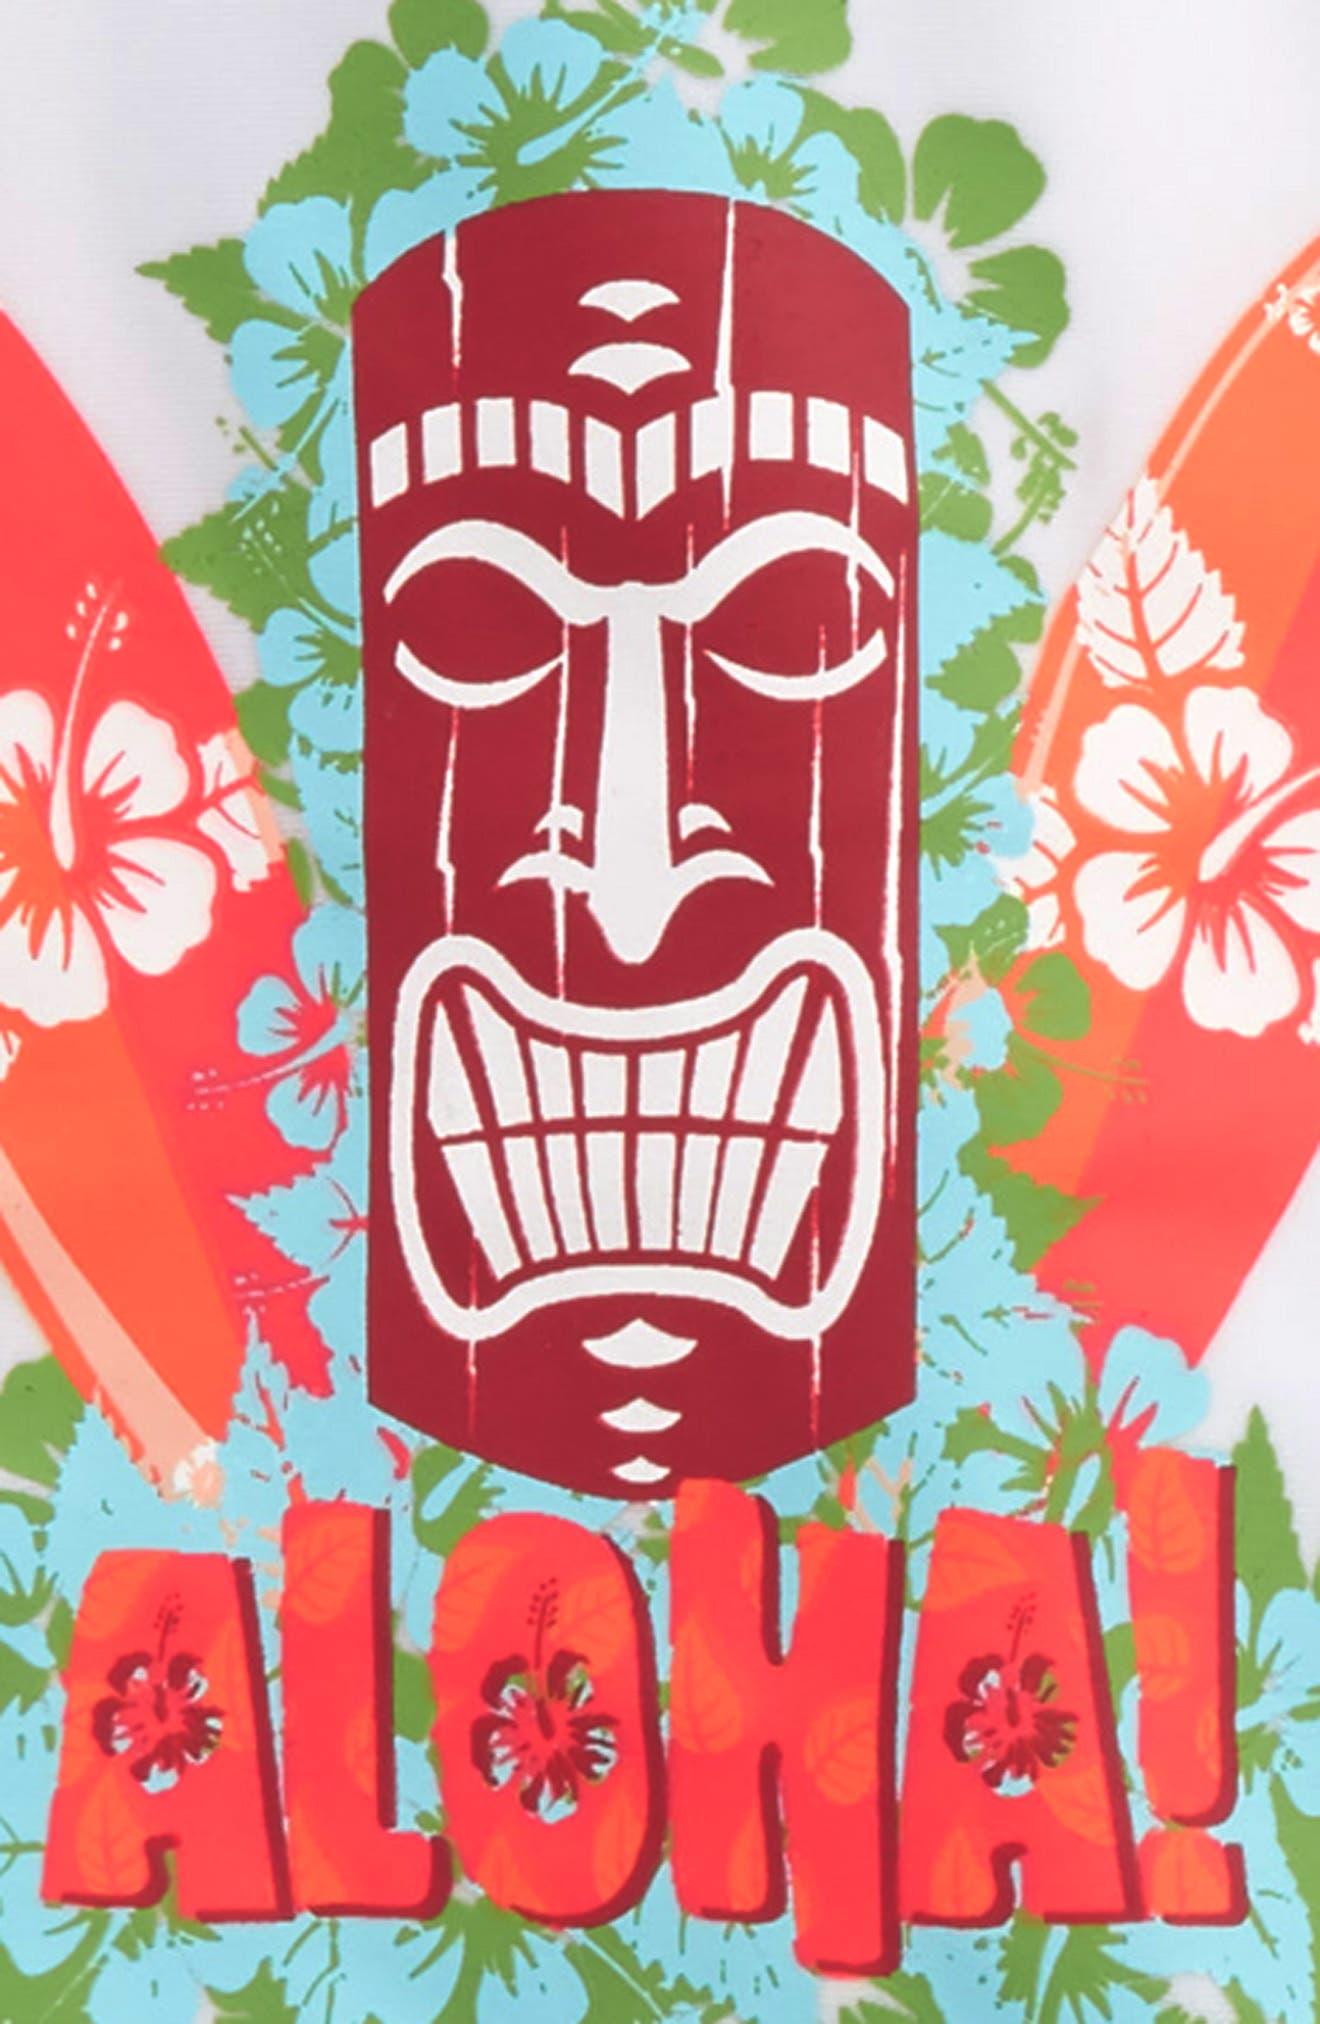 Aloha Tiki Two-Piece Rashguard Swimsuit,                             Alternate thumbnail 2, color,                             Blue/ Green